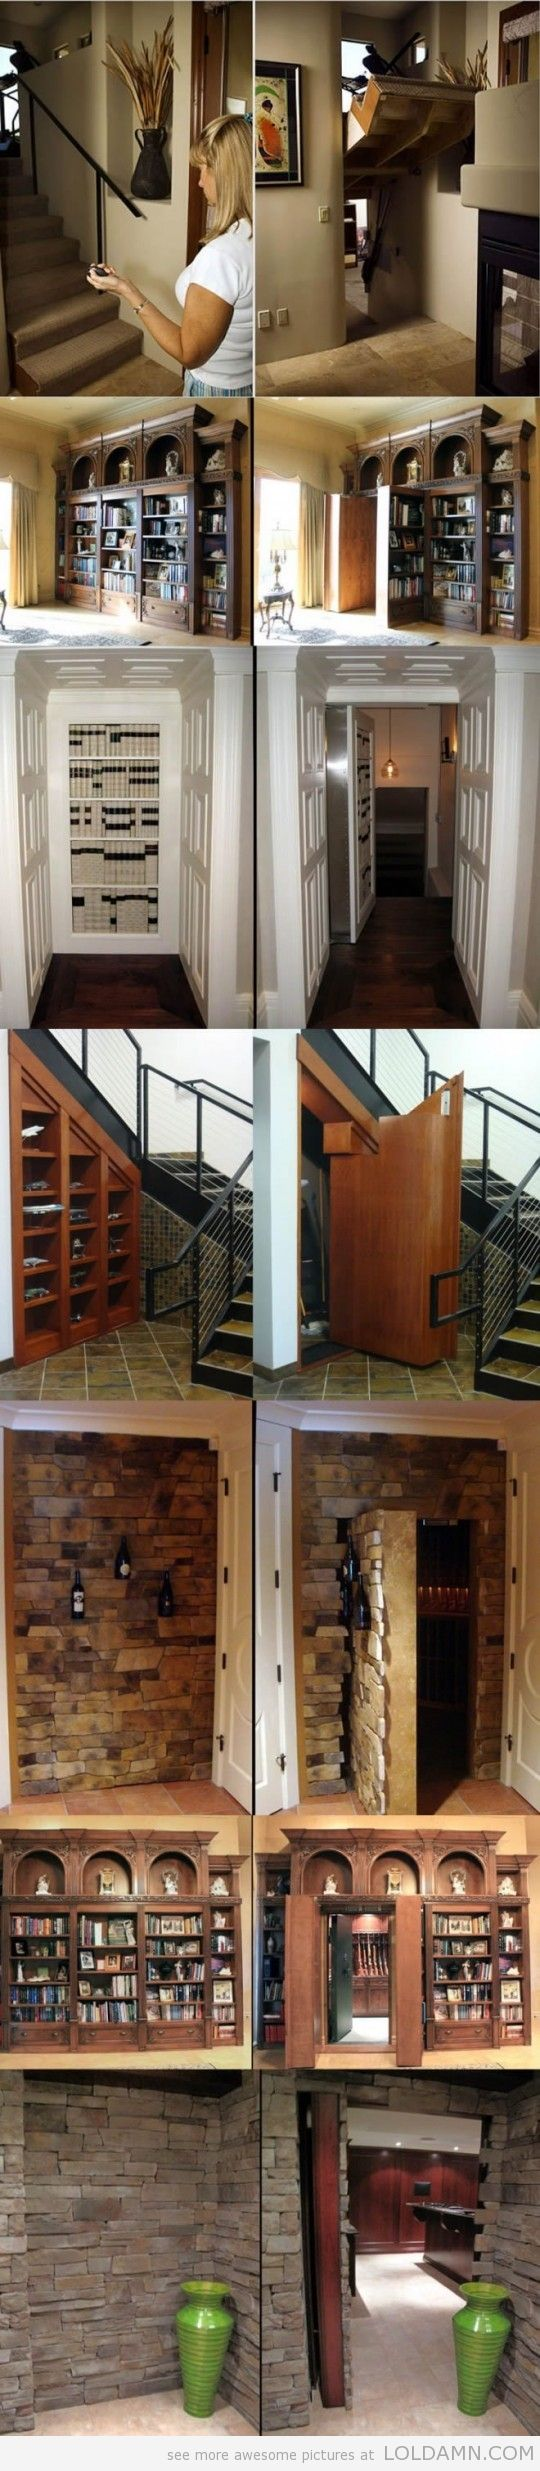 I want Hidden Passageways in my house!